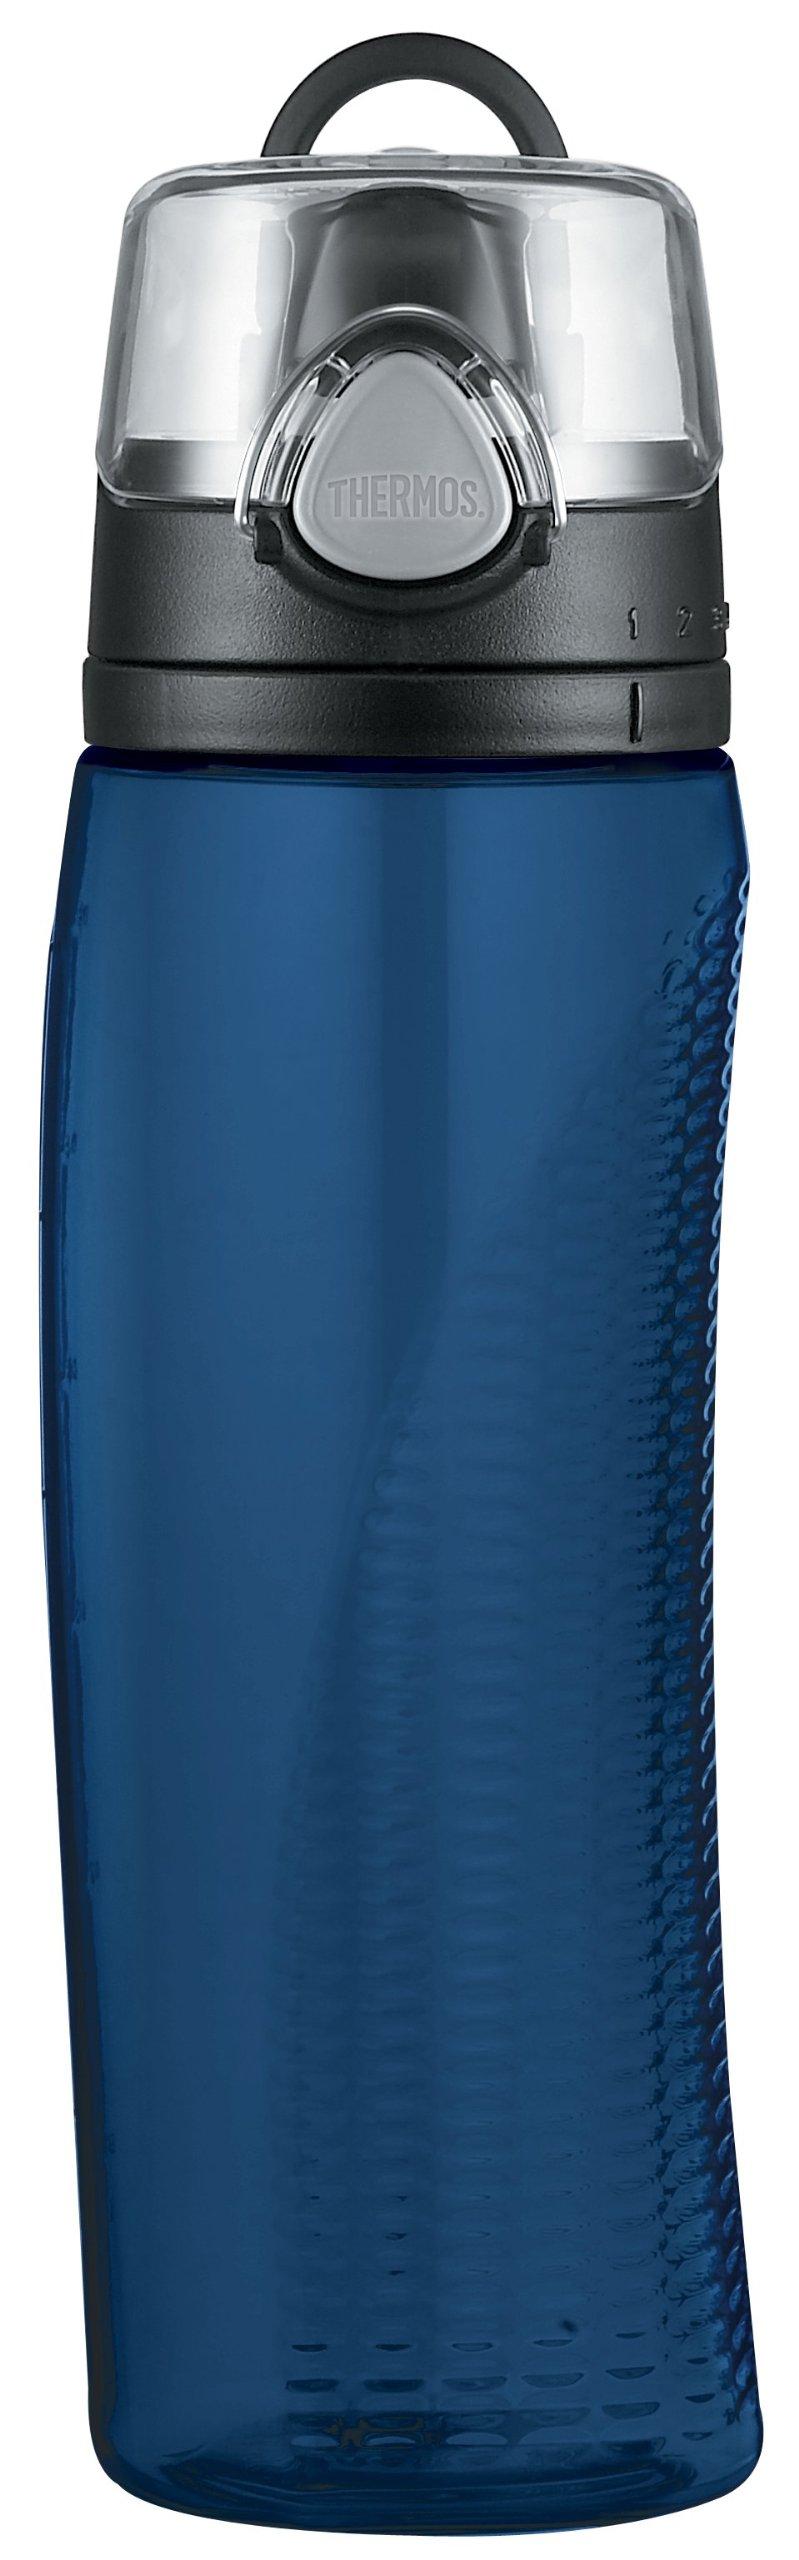 Thermos Nissan Intak Hydration Bottle